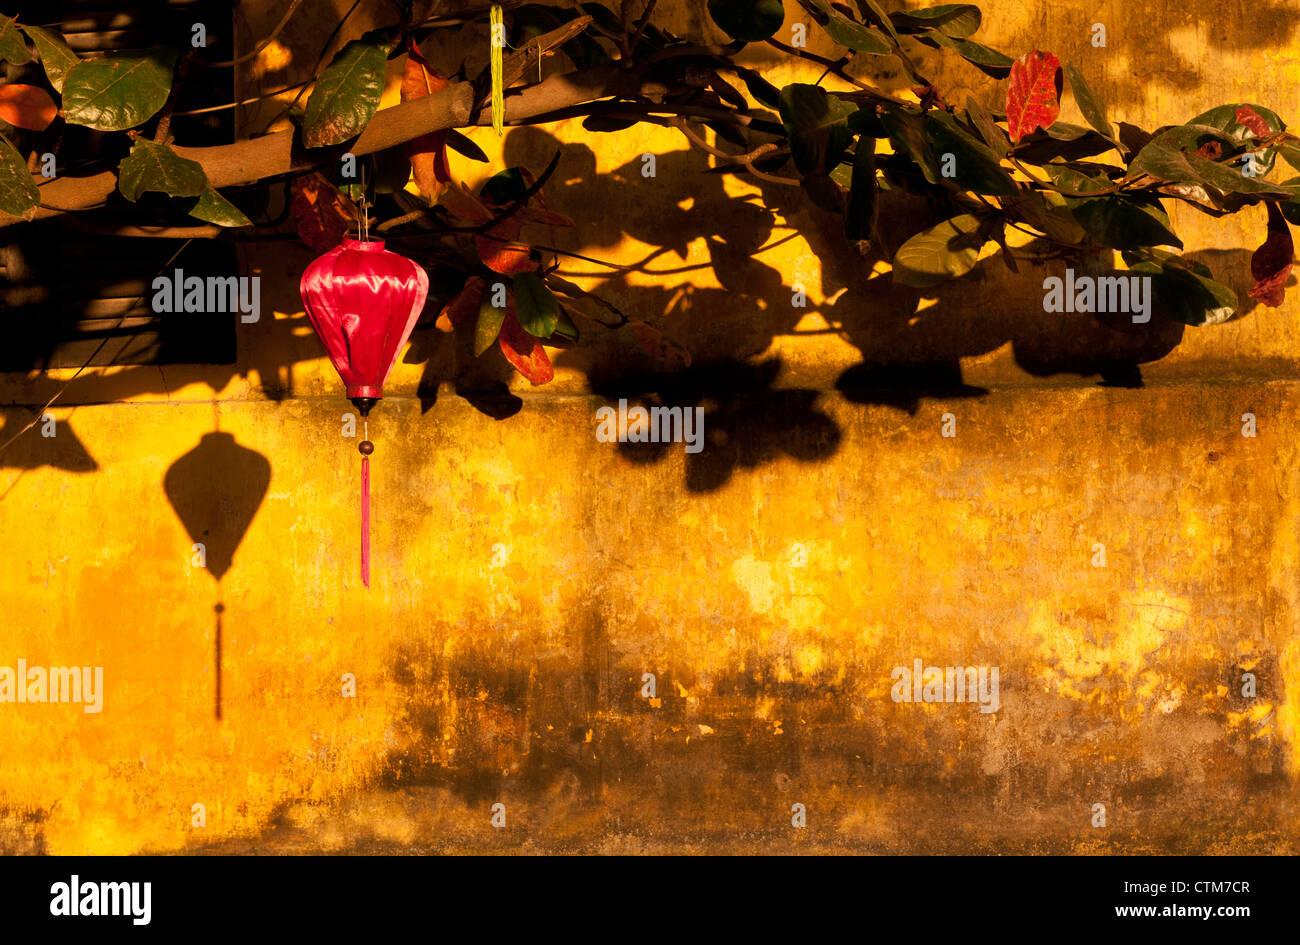 Red silk lantern on an ochre wall, late afternoon, Hoi An, Viet Nam - Stock Image